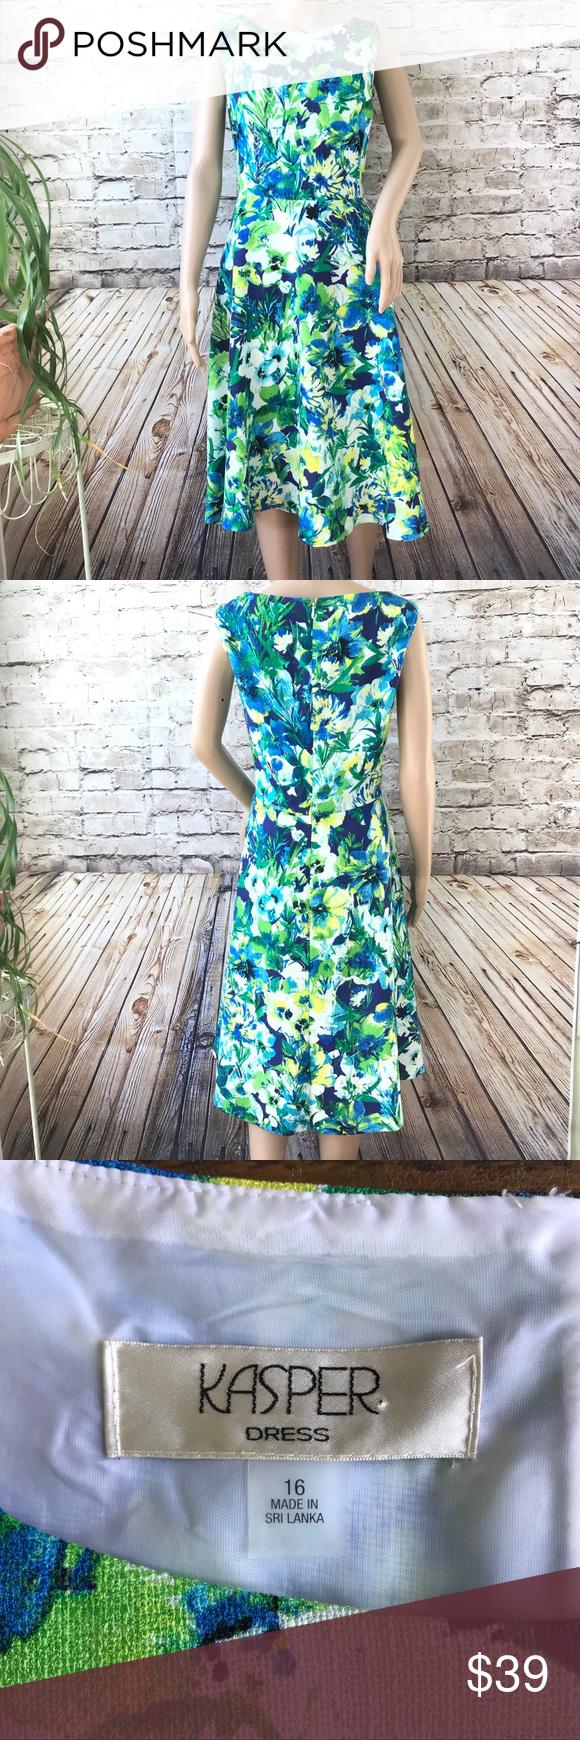 Kasper Blue Green Sleeveless Dress Size 16 Size 16 Dresses Dresses Kasper Dress [ 1740 x 580 Pixel ]